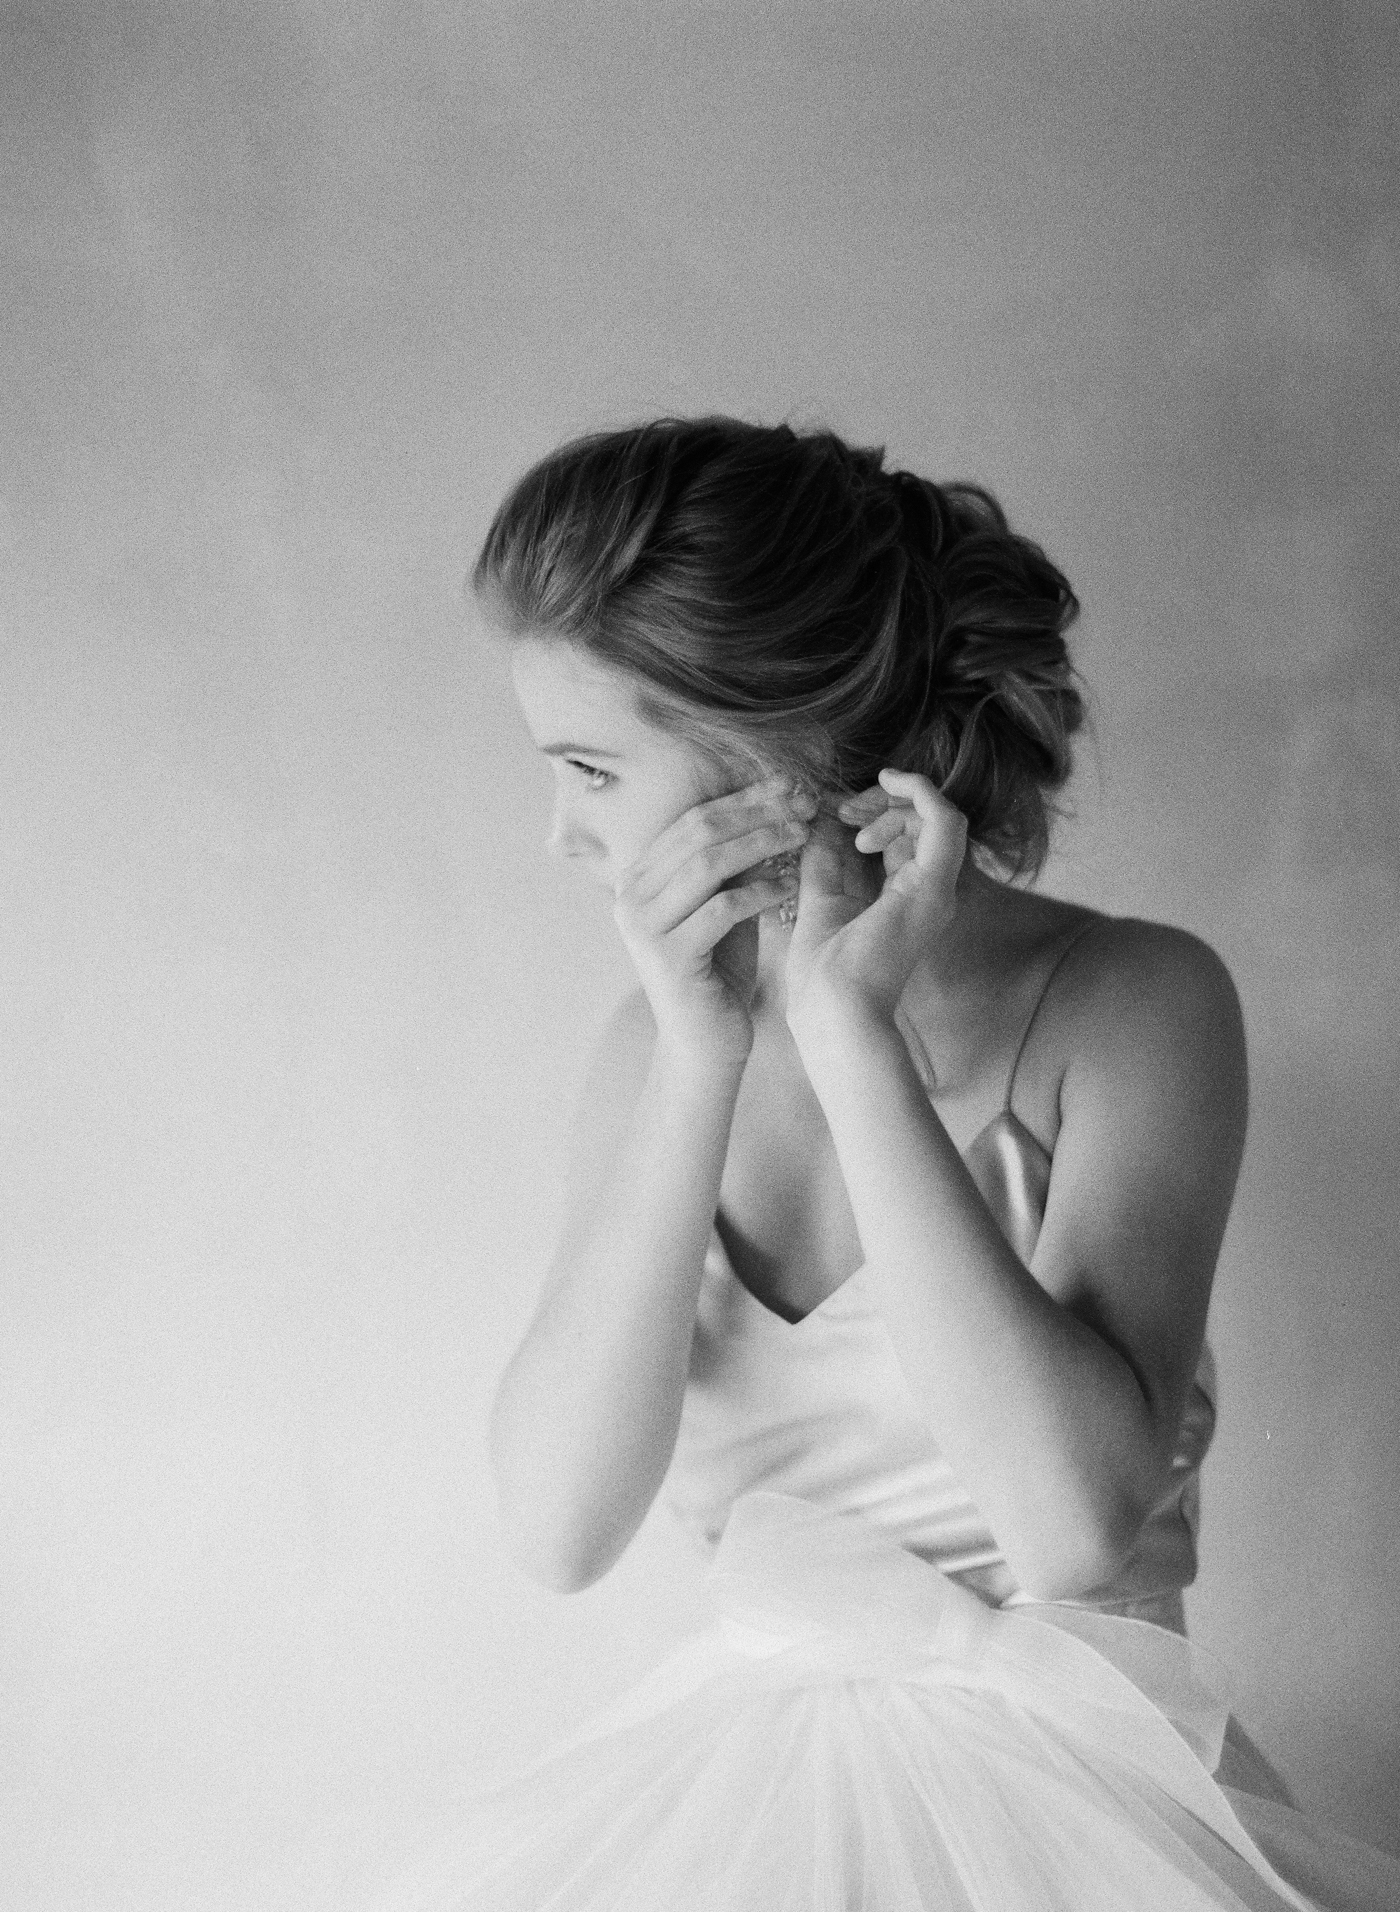 Classic-Bridal-Portraits-210-Jen_Huang-BHLDN-Winter-Bride-166-Jen_Huang-000010640014.jpg